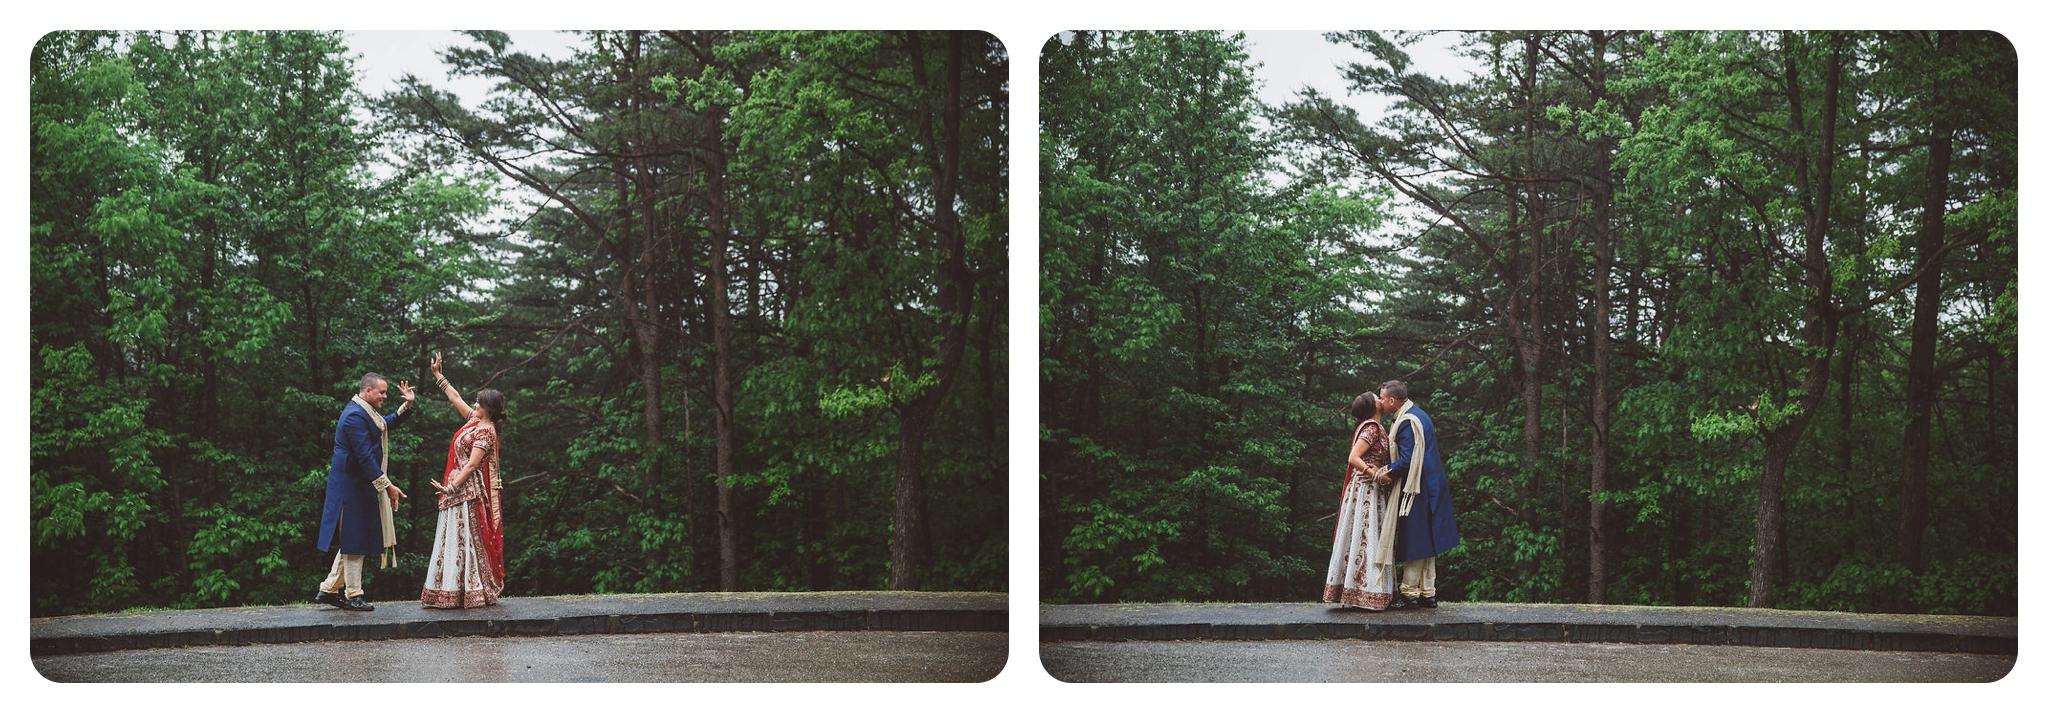 Virginia-Weddings-Center-in-the-Square-Pat-Cori-Photography-028.jpg